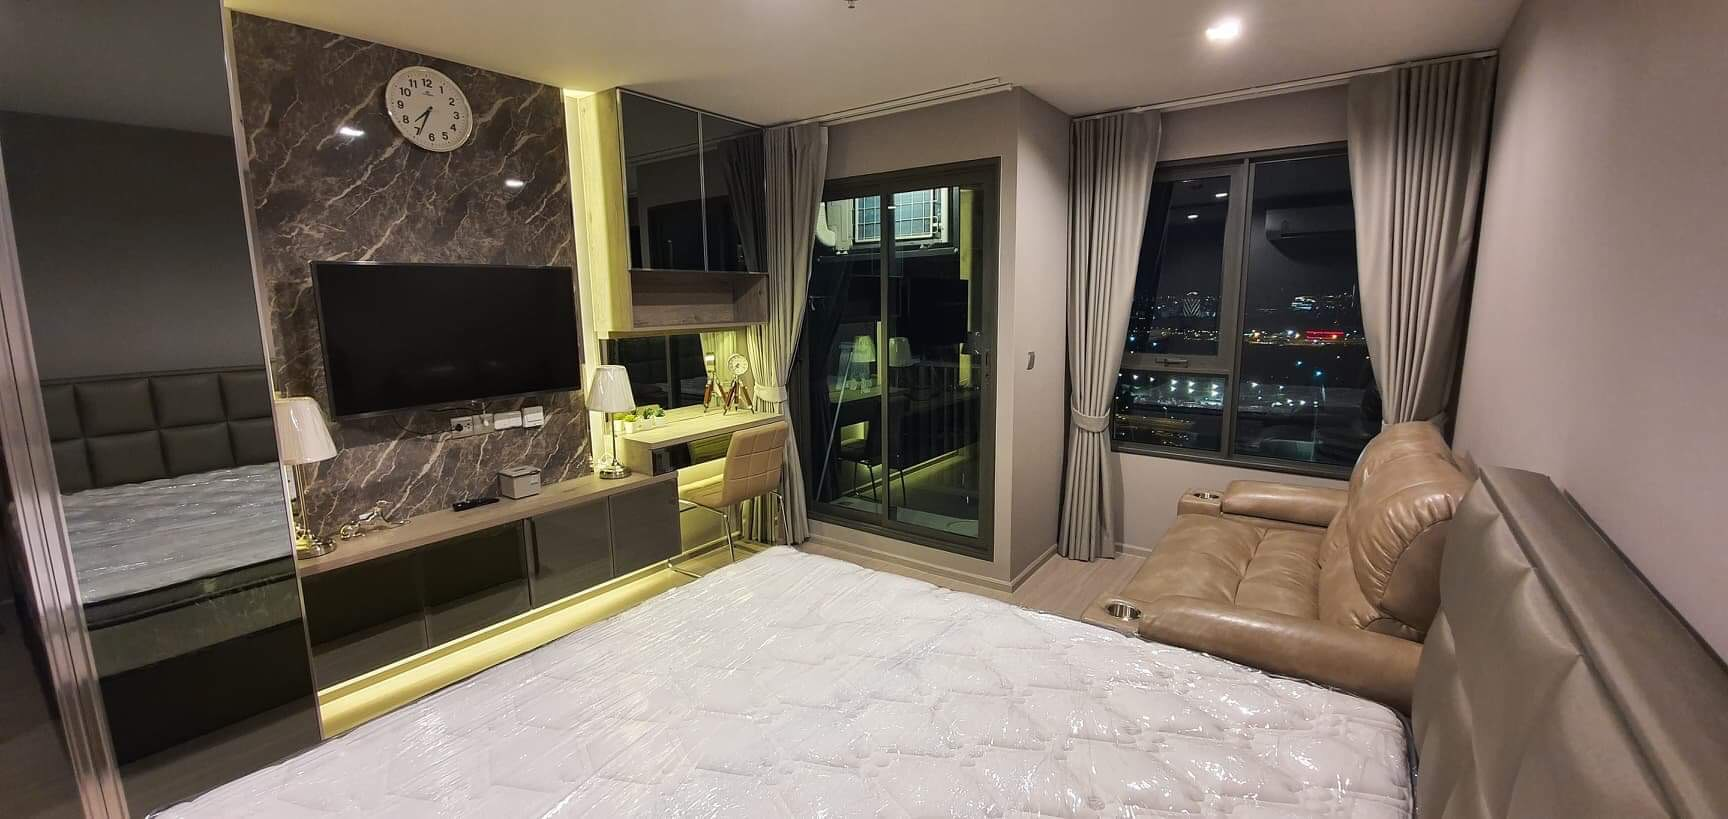 Life Ladprao for Rent – MRT Phaholyothin 500 meters – Unit 36 Sq.m.